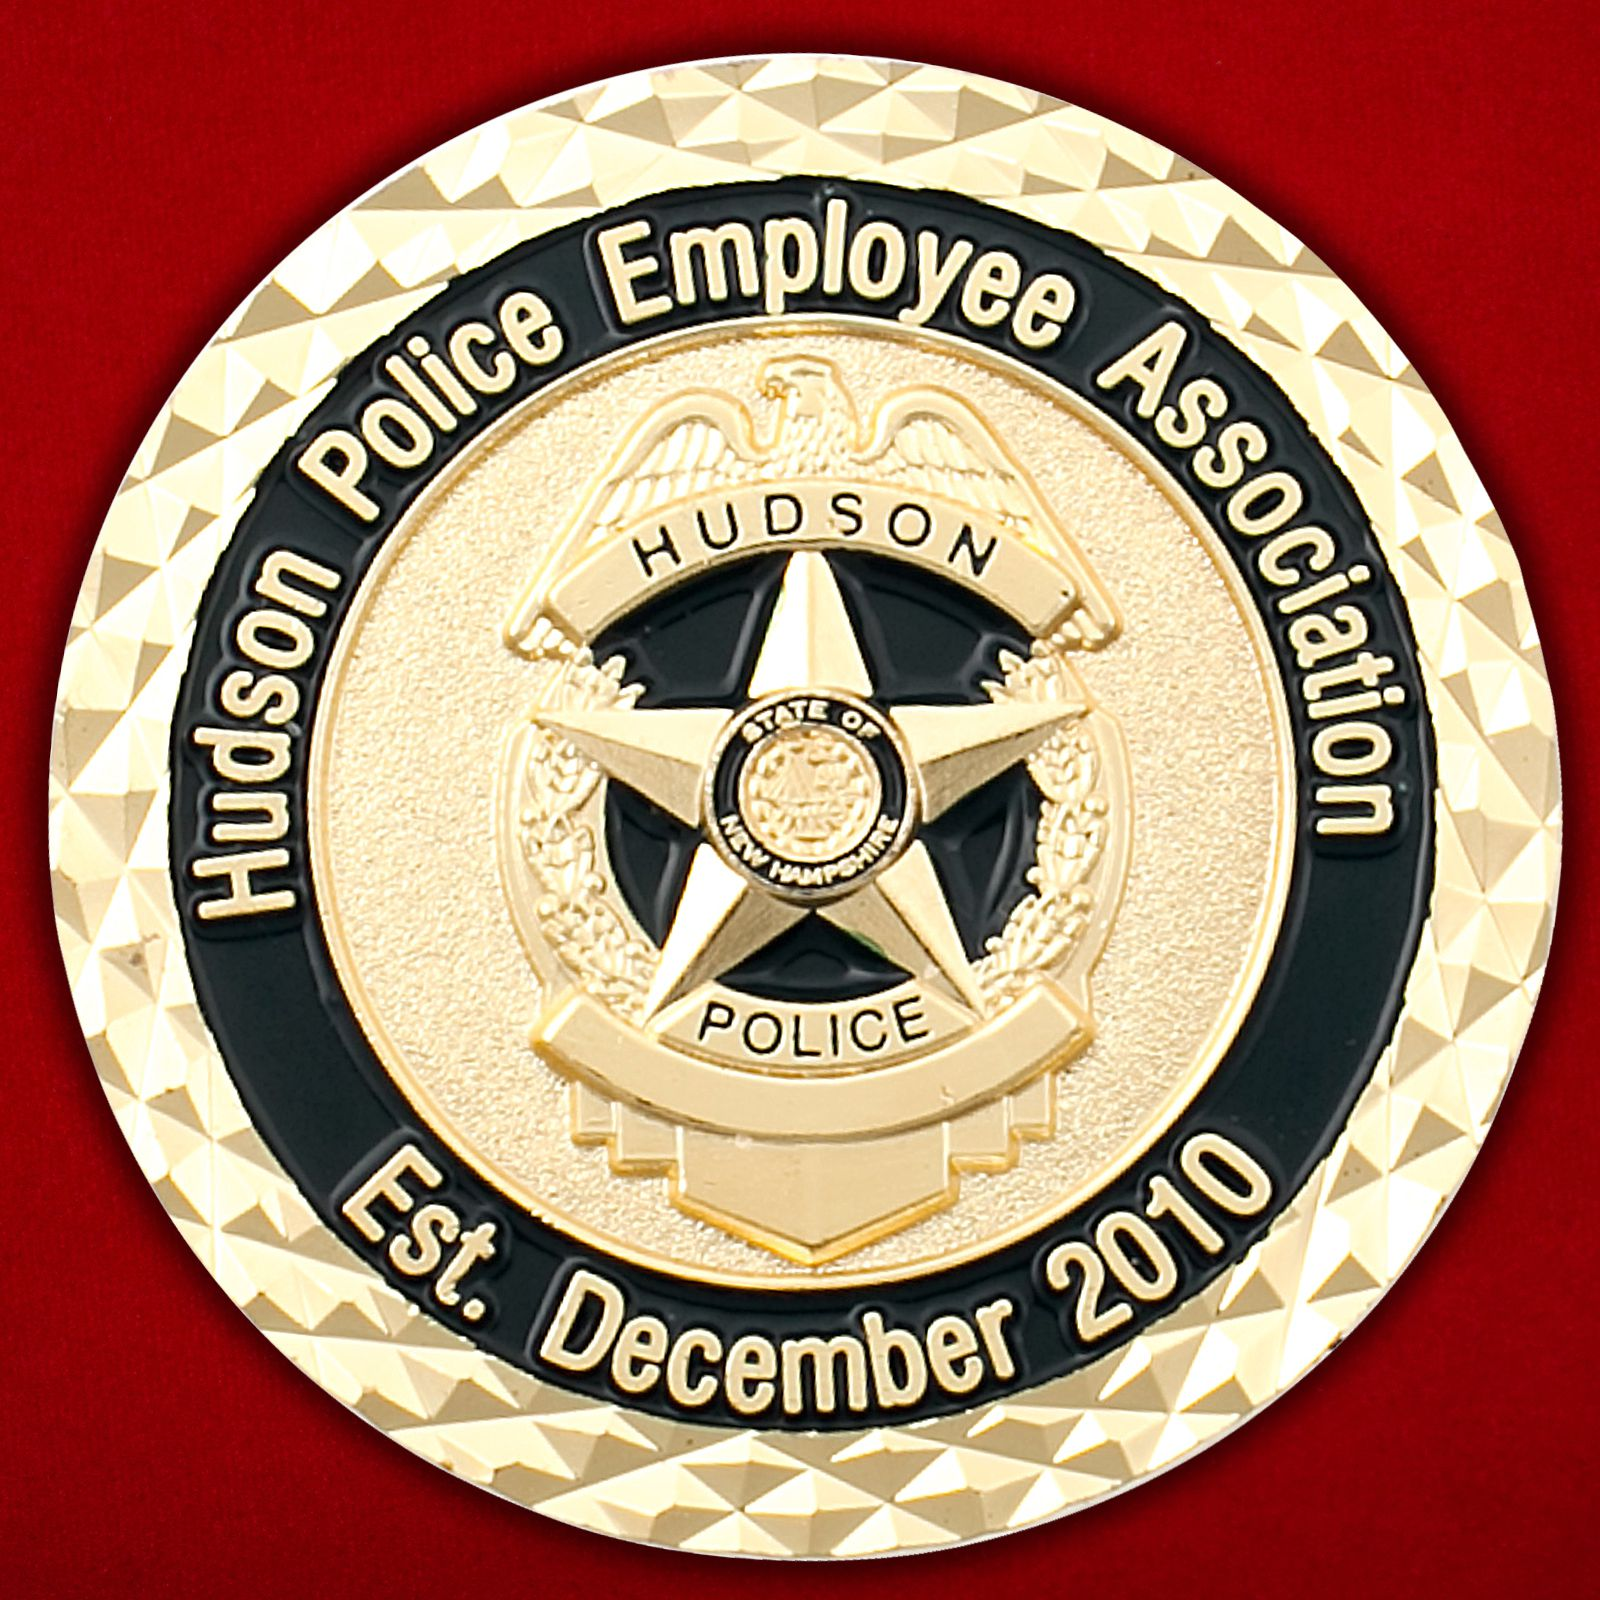 Челлендж коин Ассоциации сотрудников полиции Хадсона (Нью-Гемпшир)